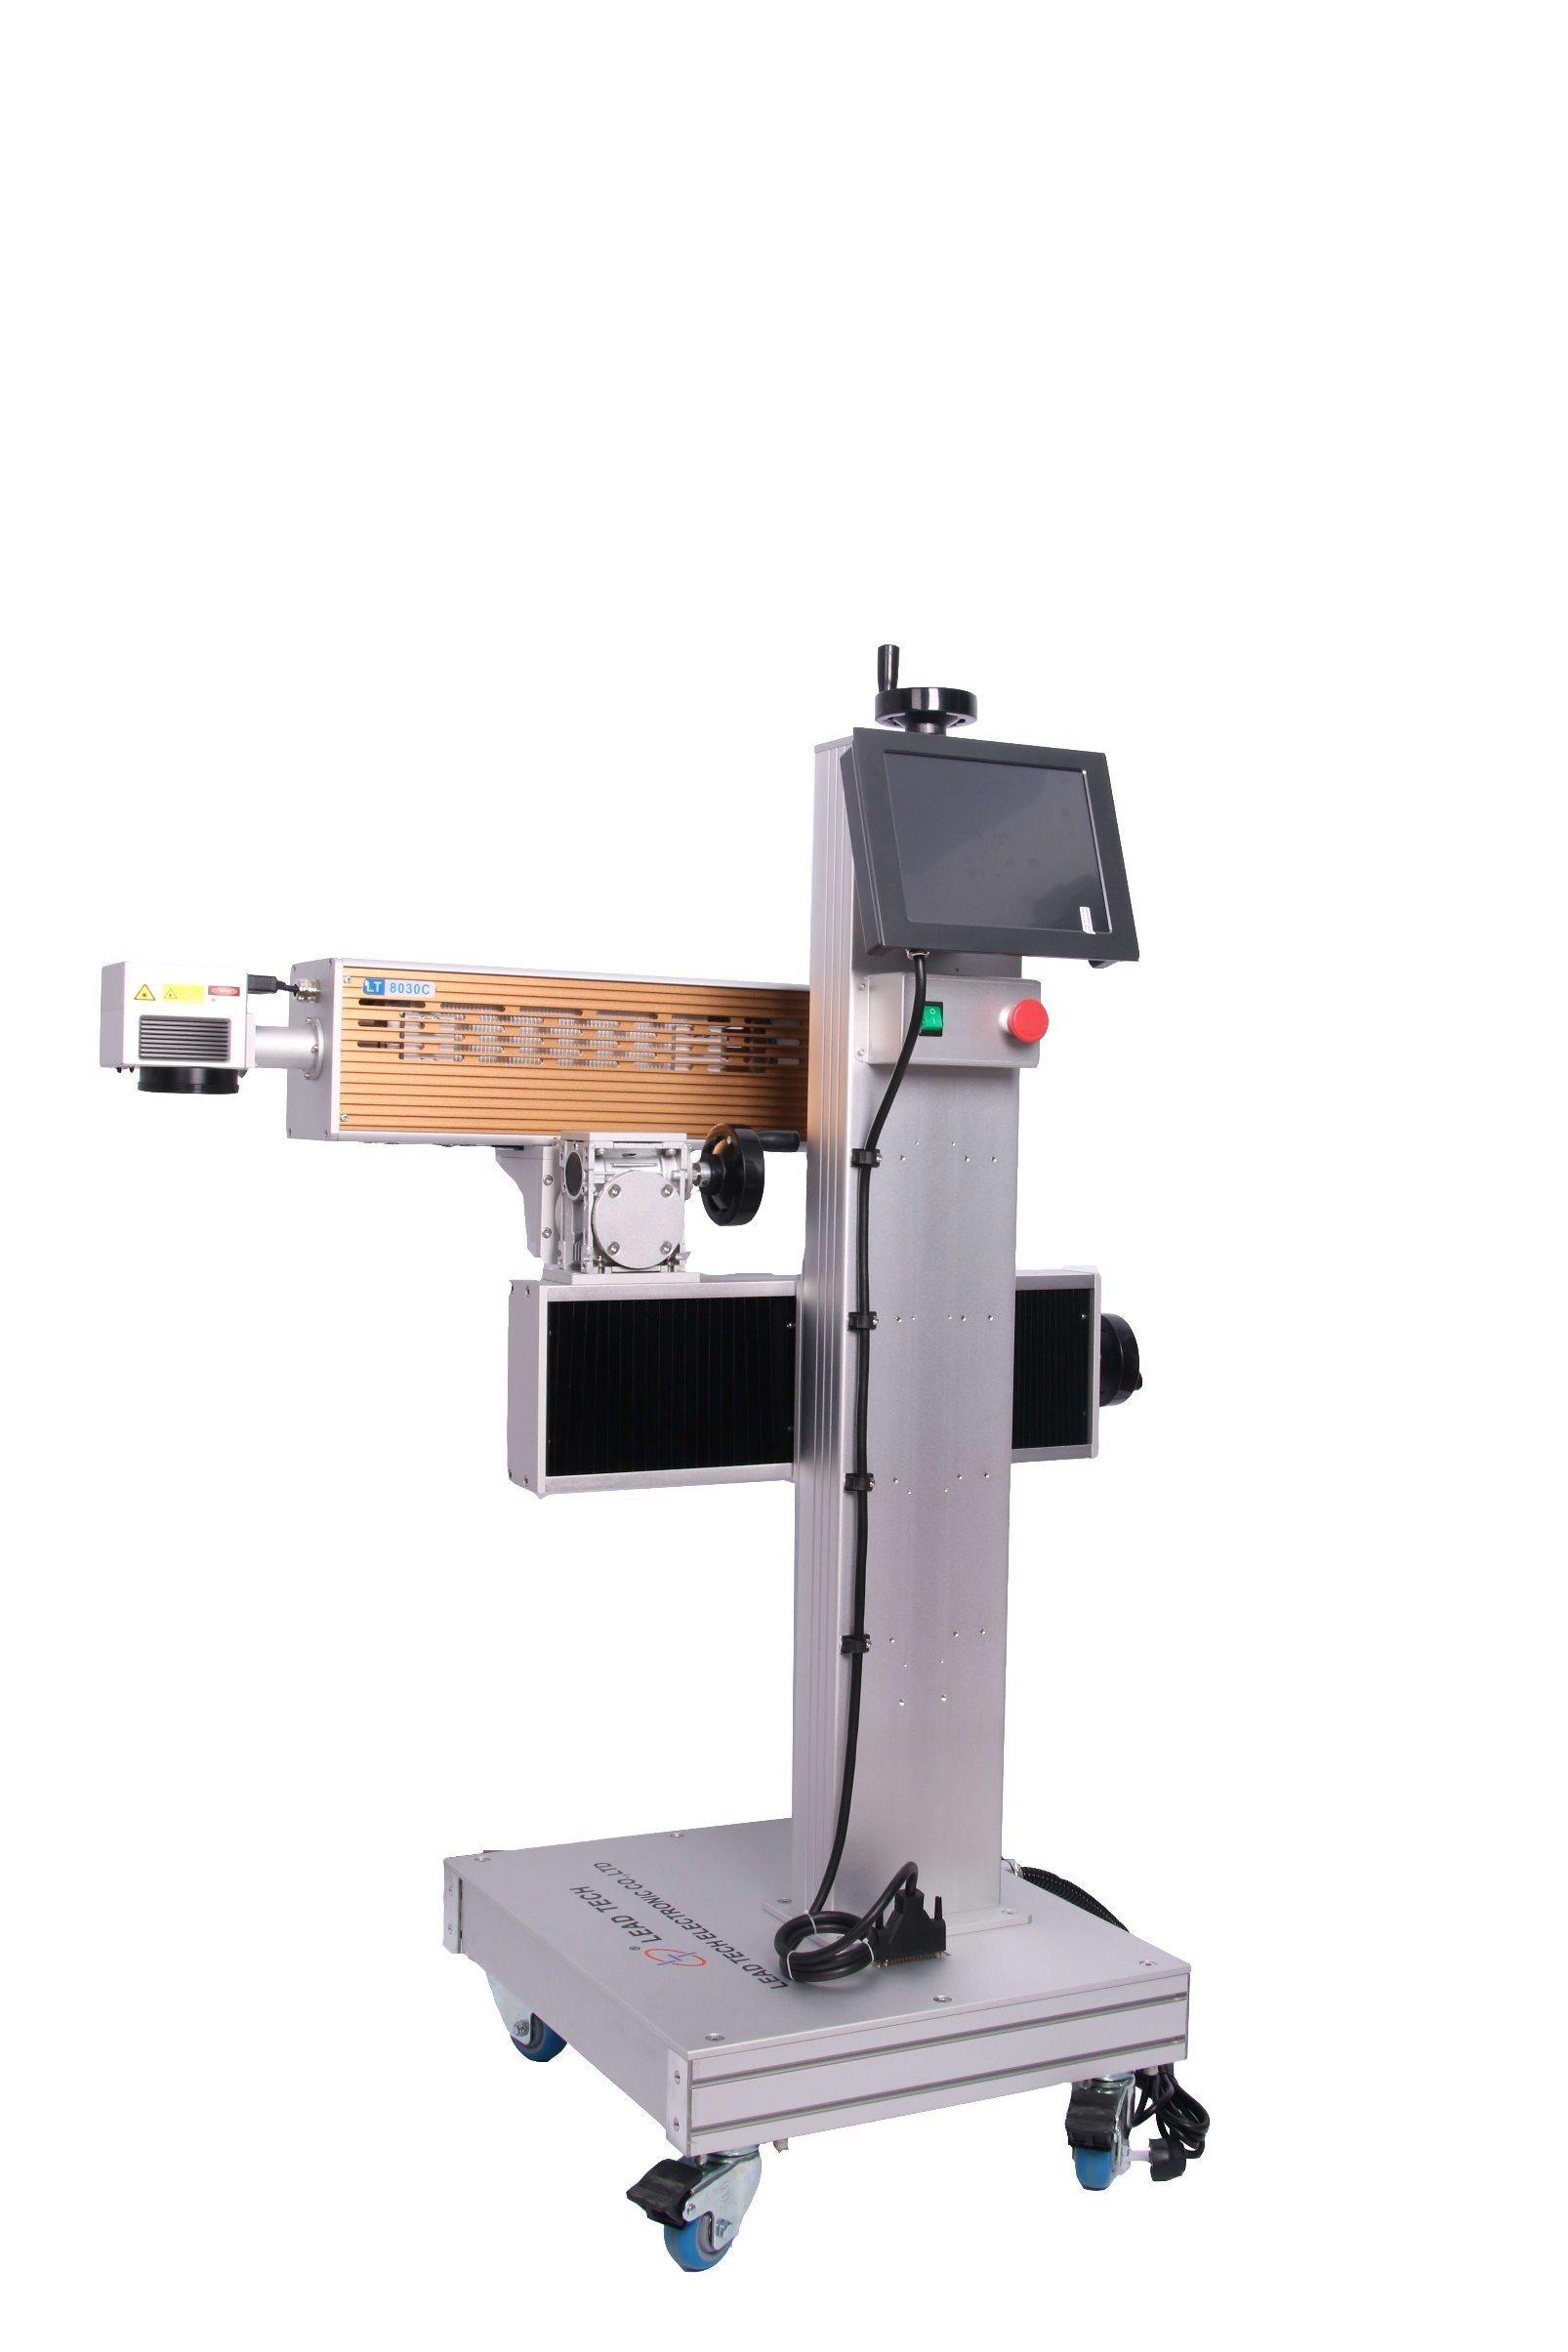 Lt8020c/Lt8030c CO2 20W/30W High Performance Digital IC Laser Printer